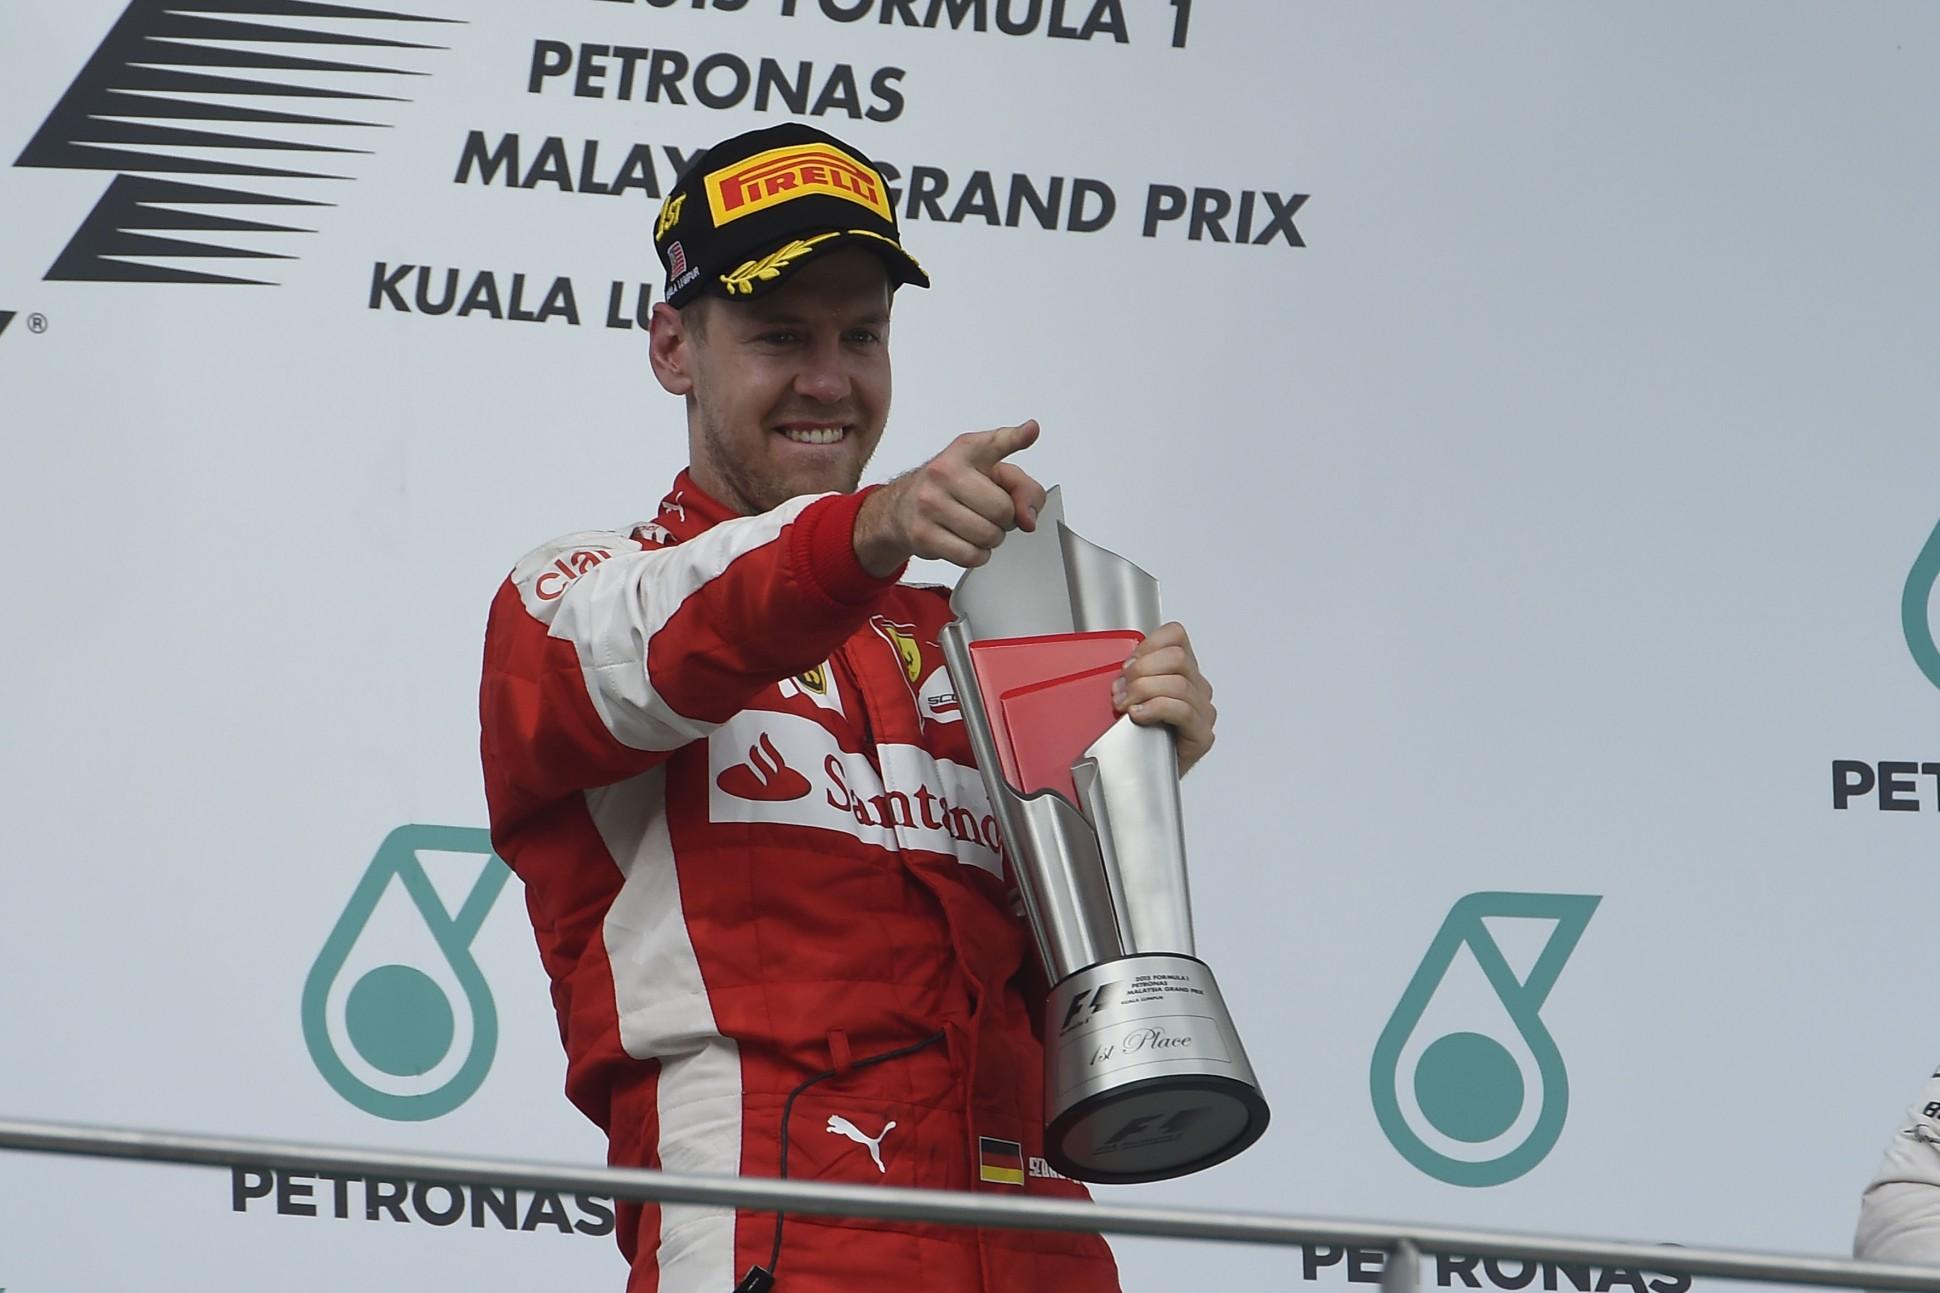 Vettel auf dem Siegerpodest in Malaysia. Copyright: Ferrari